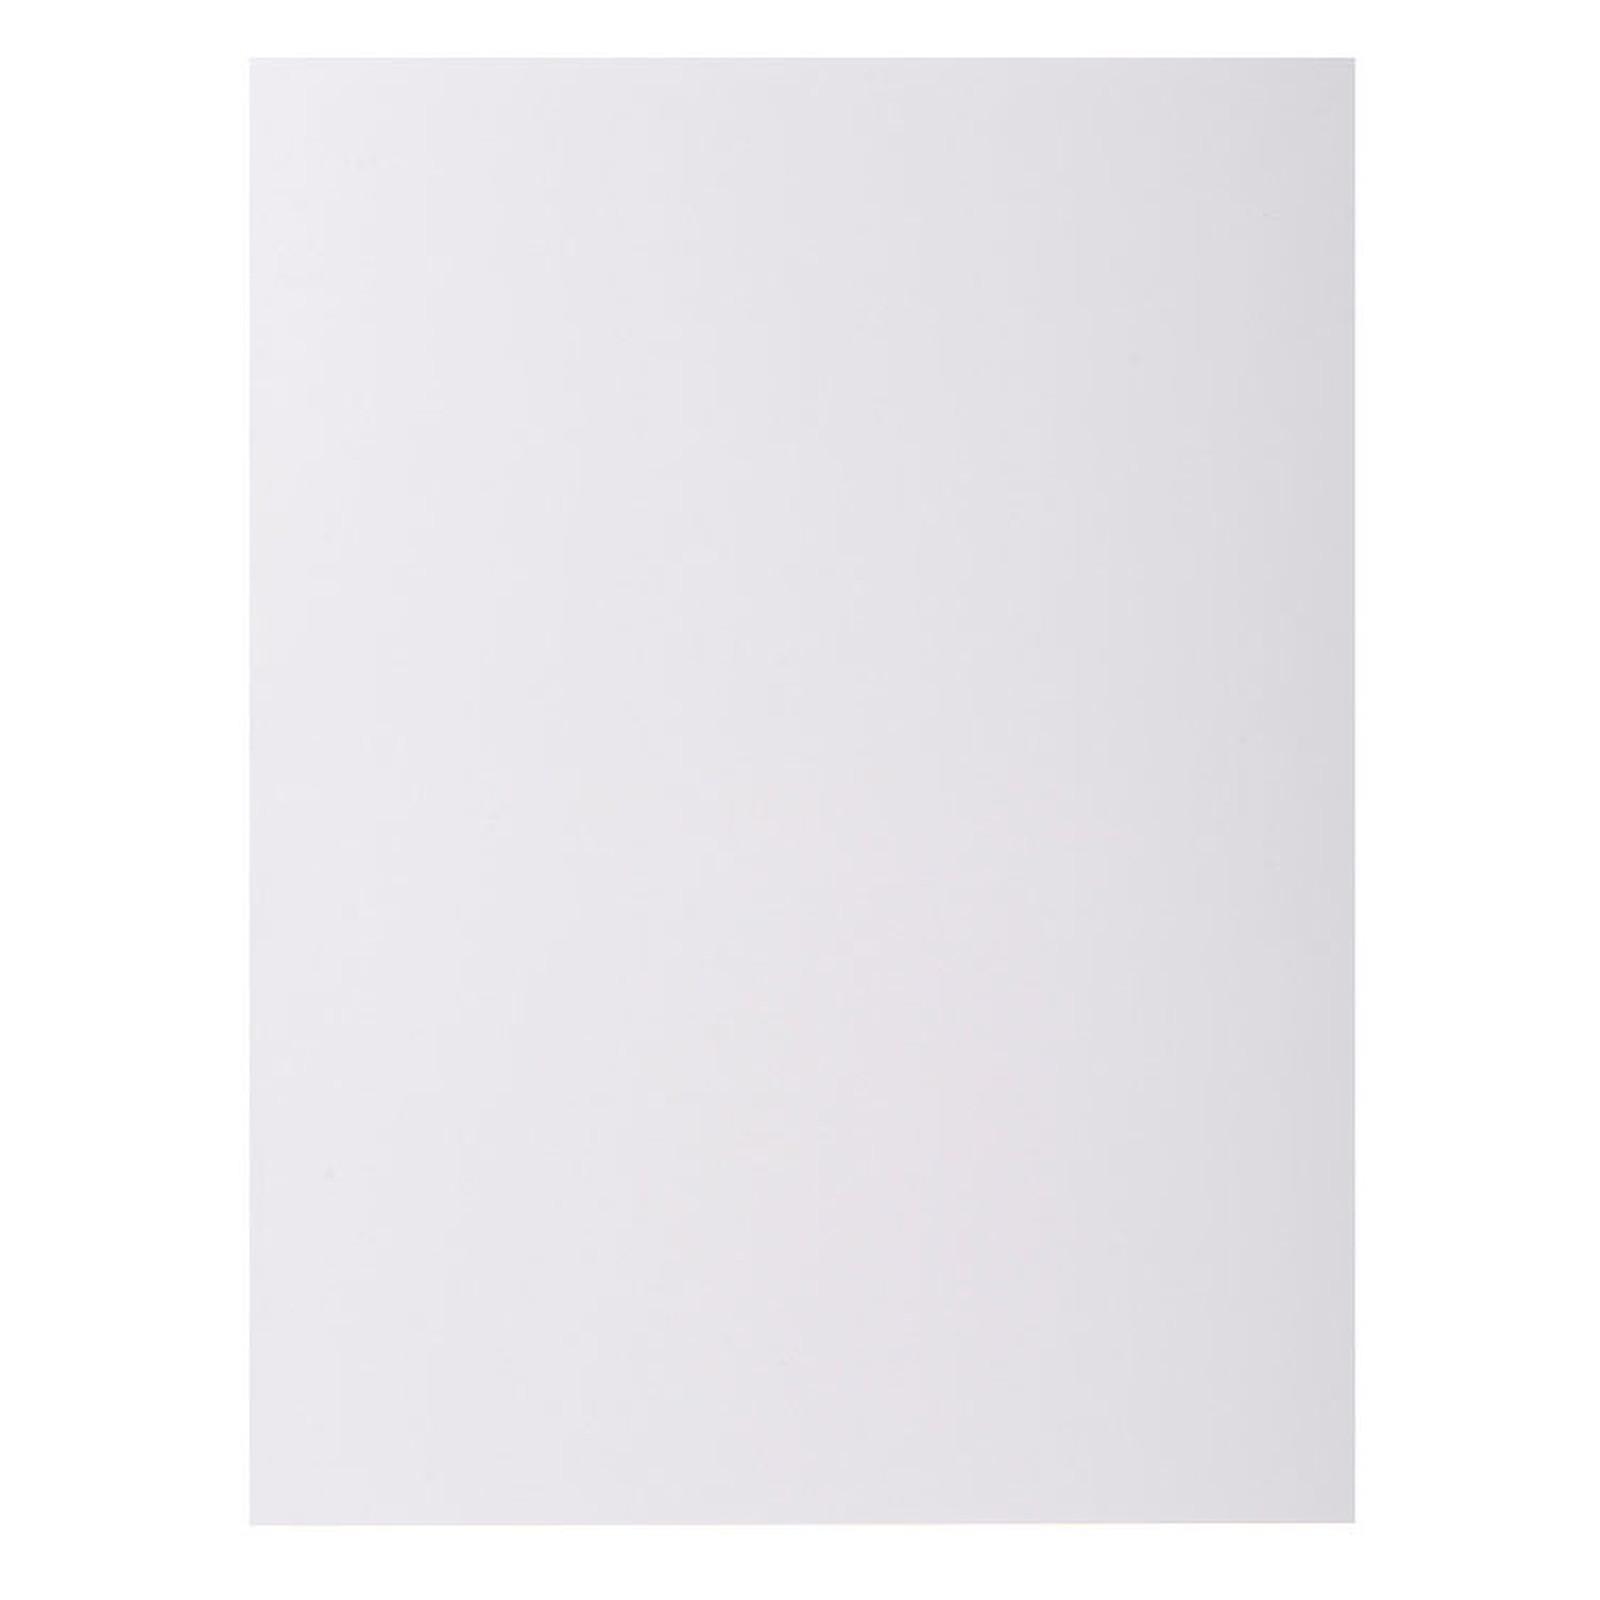 "Exacompta Sous chemises Rock""s 80 Blanc x 100"